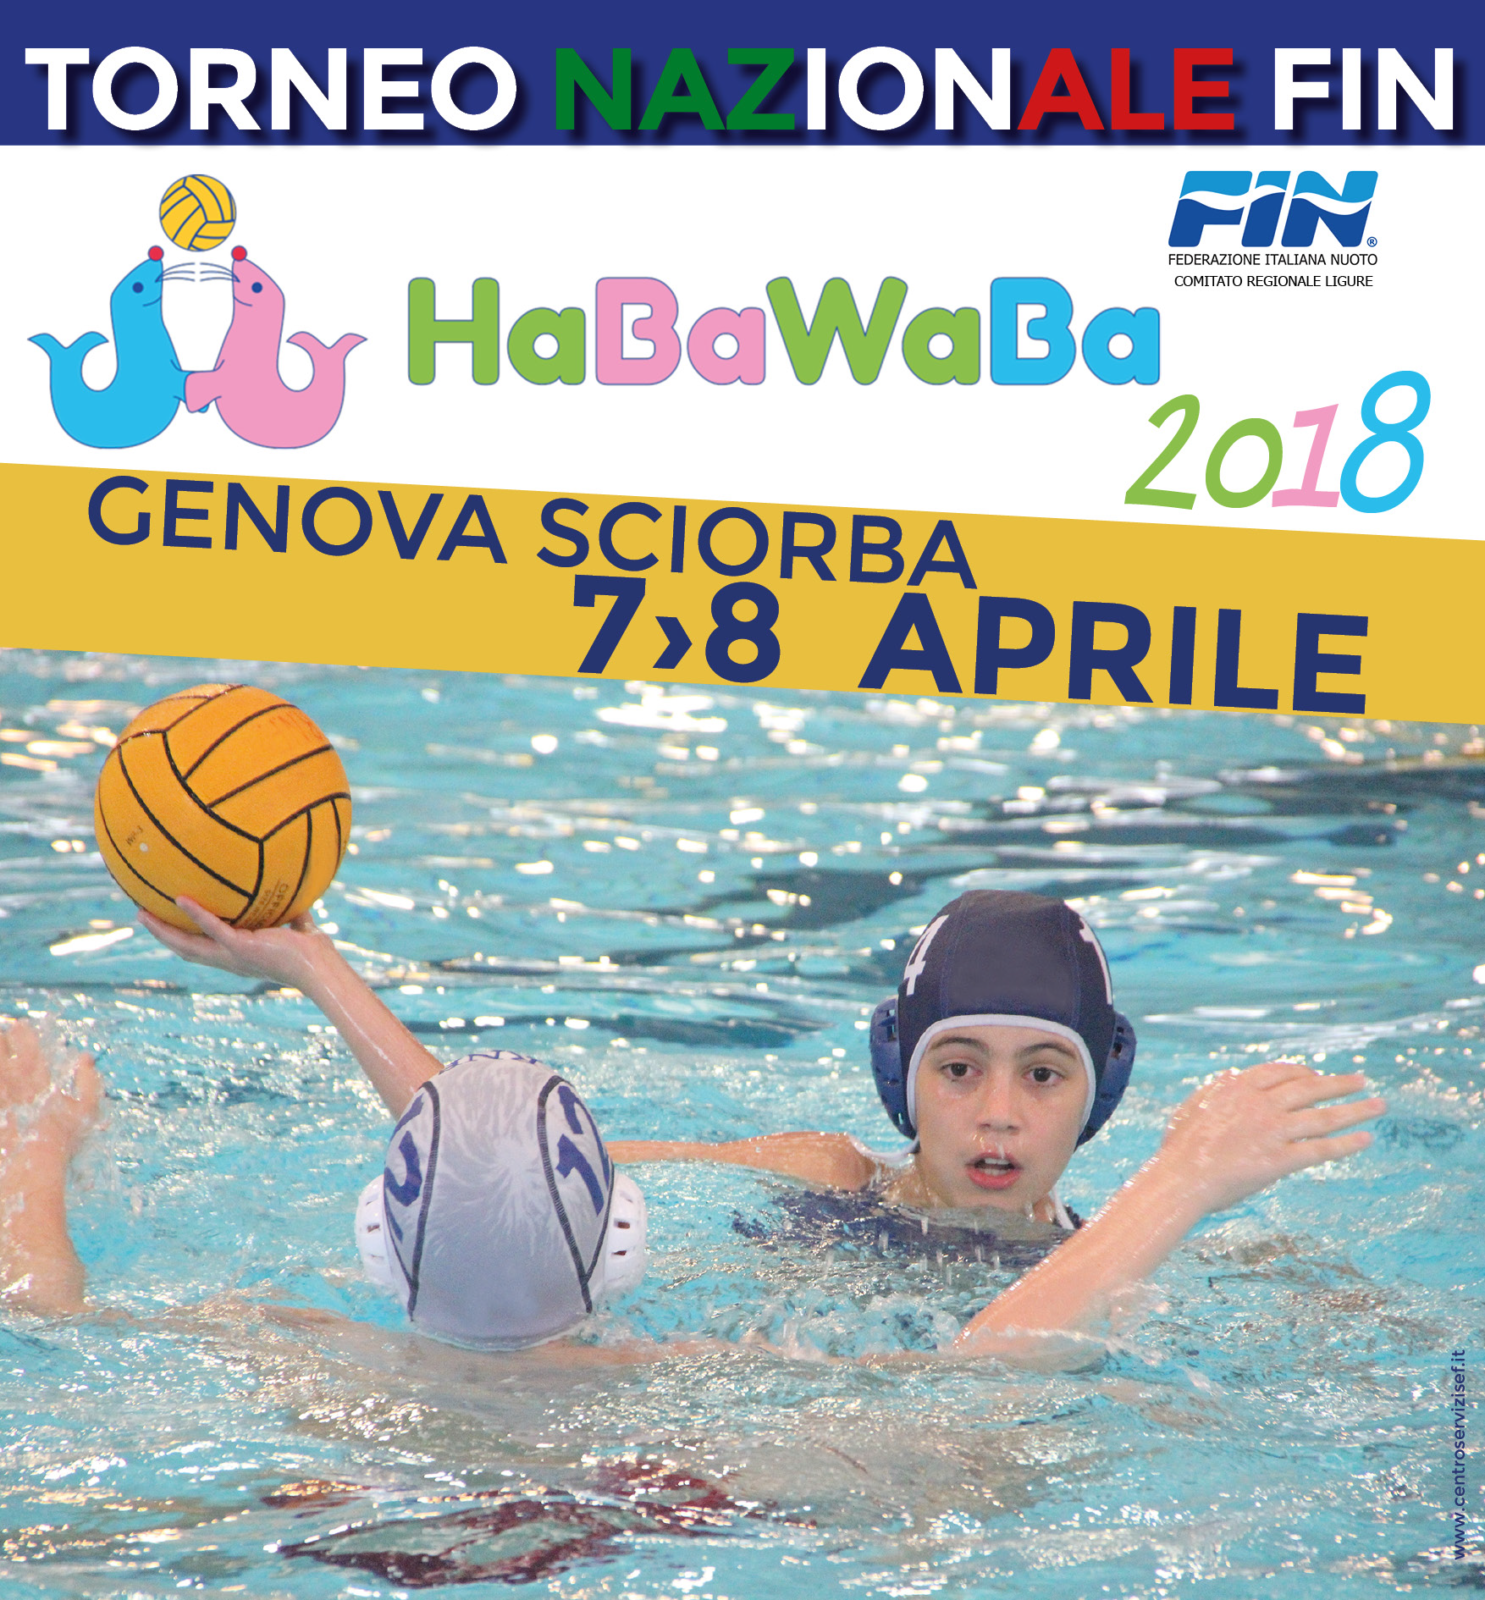 tornei-nazionali-fin-habawaba-genova-7-8-aprile-2018-locandina